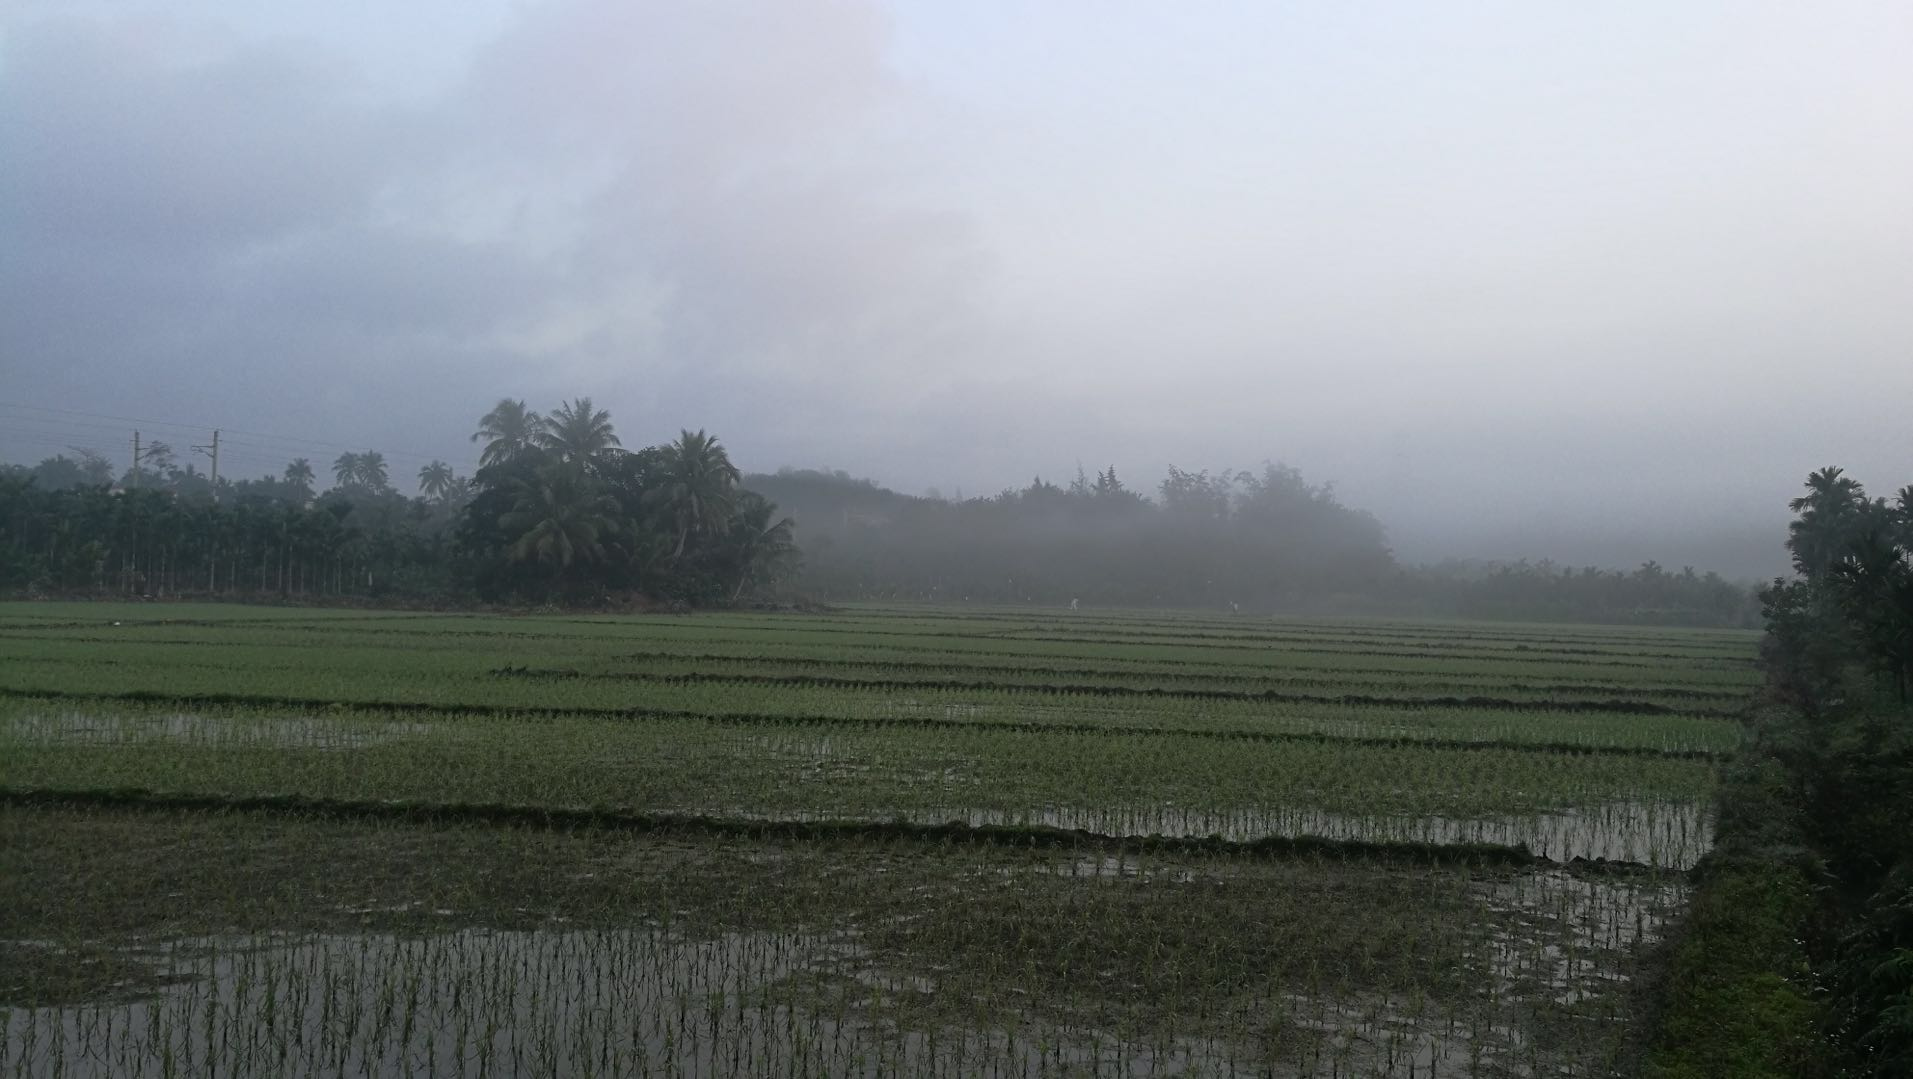 Chunyu